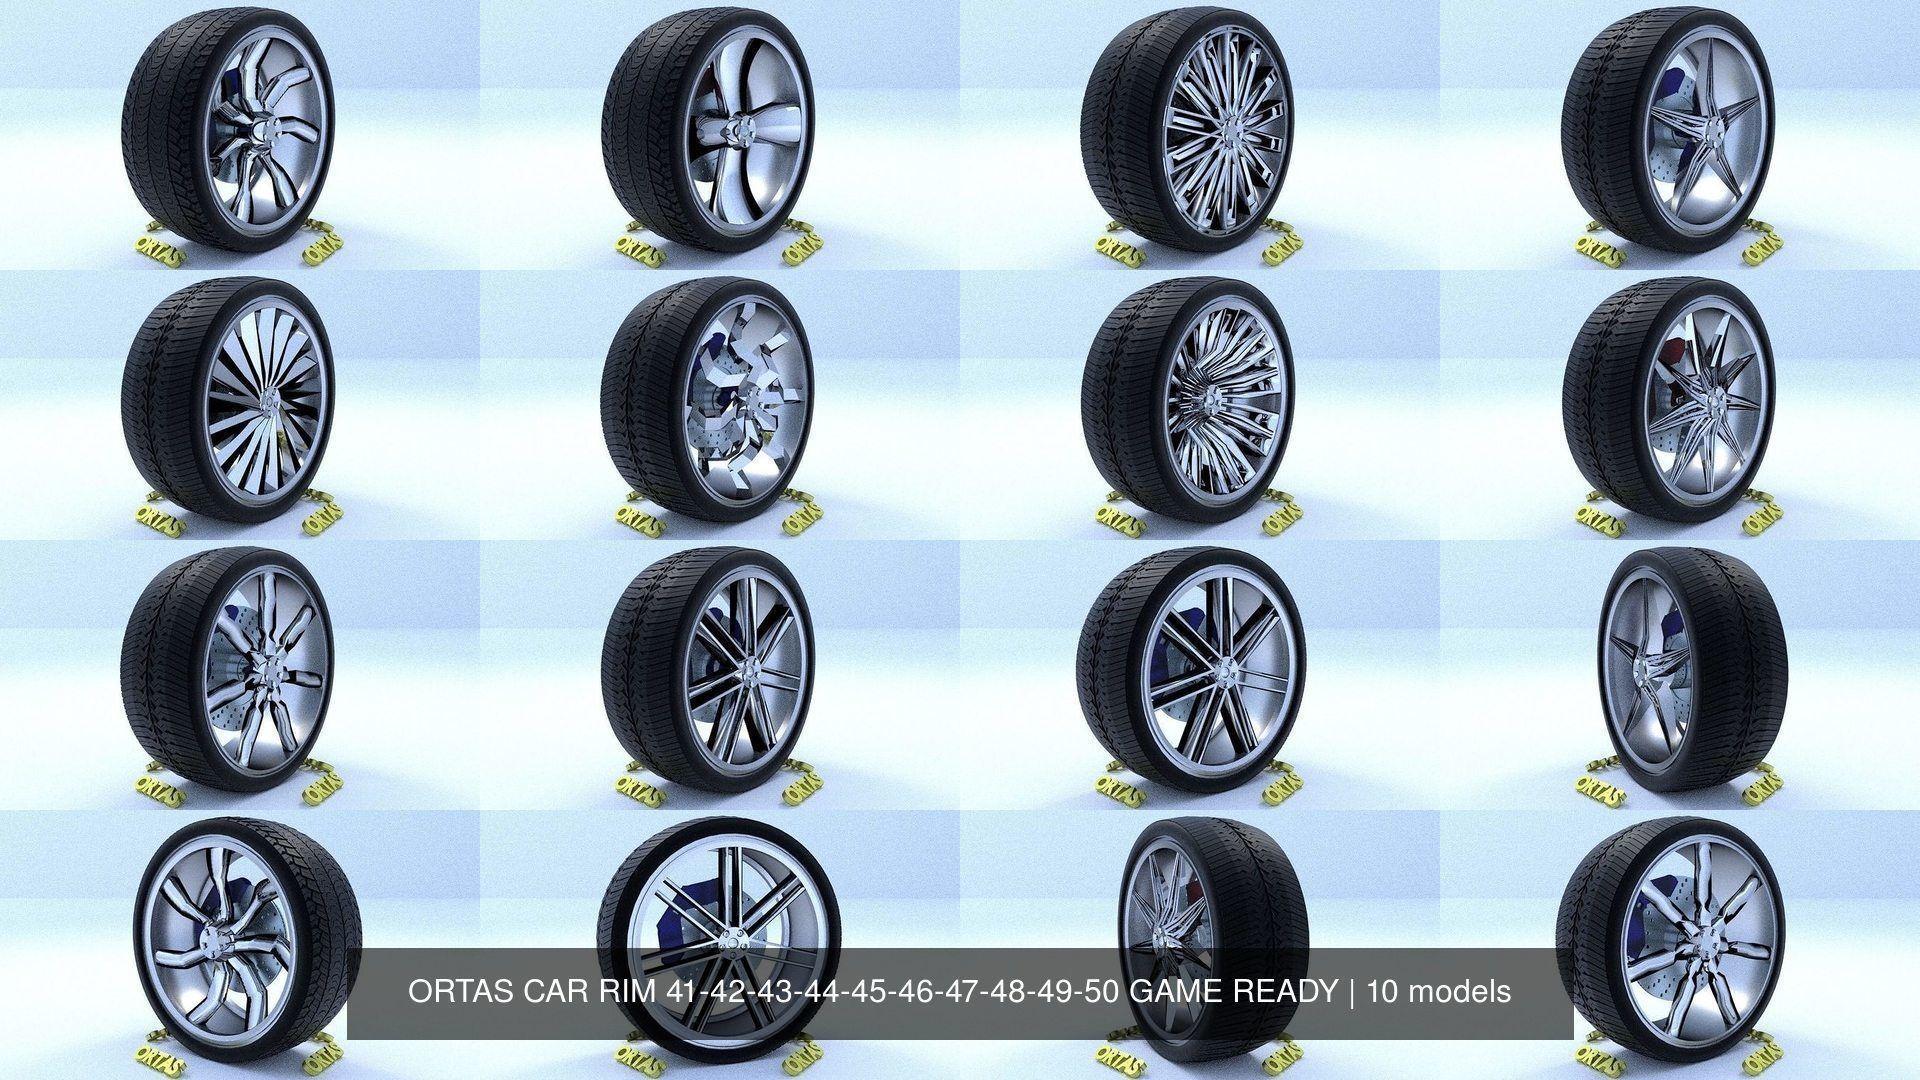 ORTAS CAR RIM 41-42-43-44-45-46-47-48-49-50 GAME READY